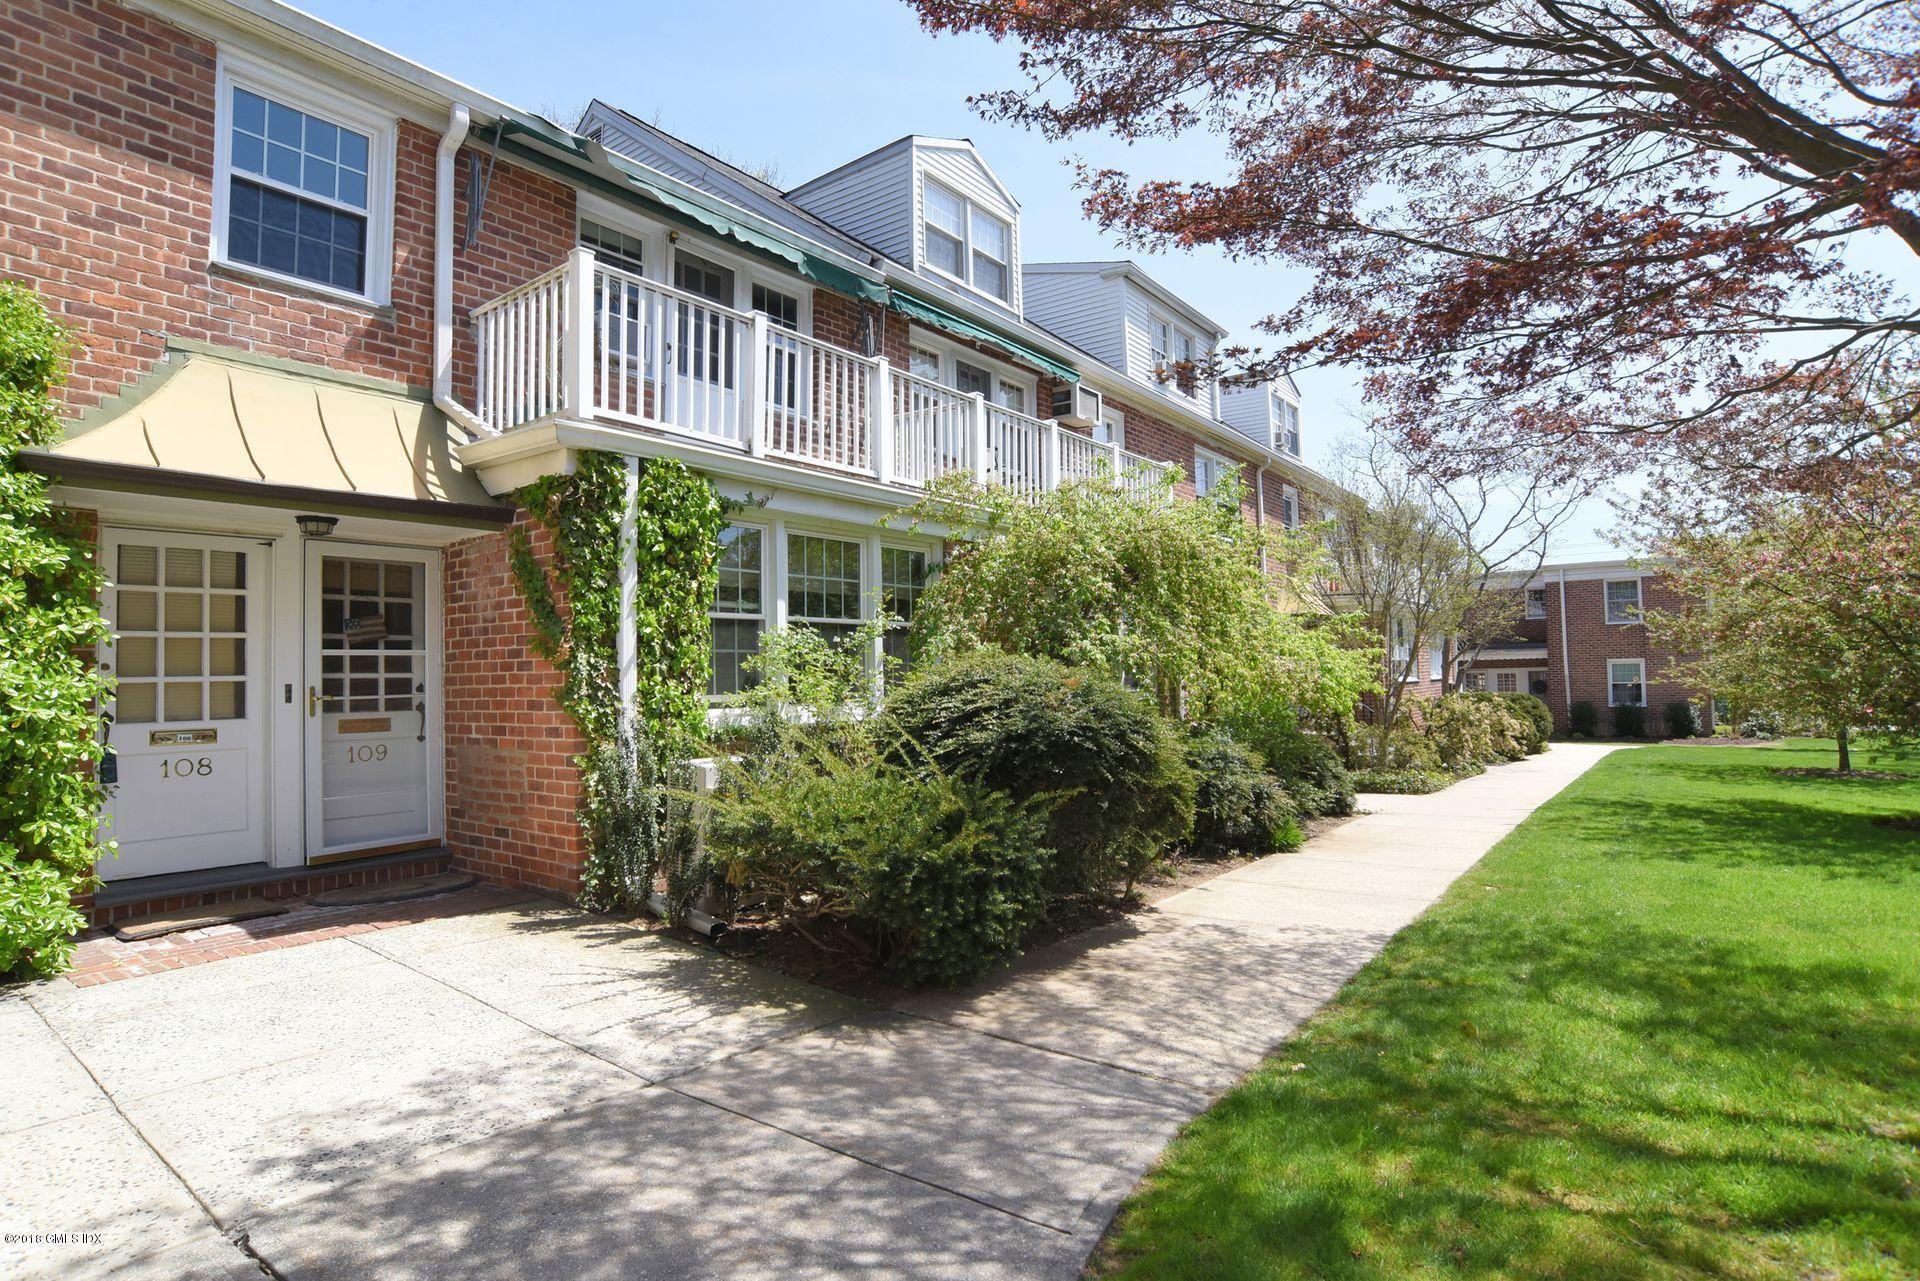 108 Putnam Park Greenwich,Connecticut 06830,3 Bedrooms Bedrooms,2 BathroomsBathrooms,Co-op,Putnam Park,105070